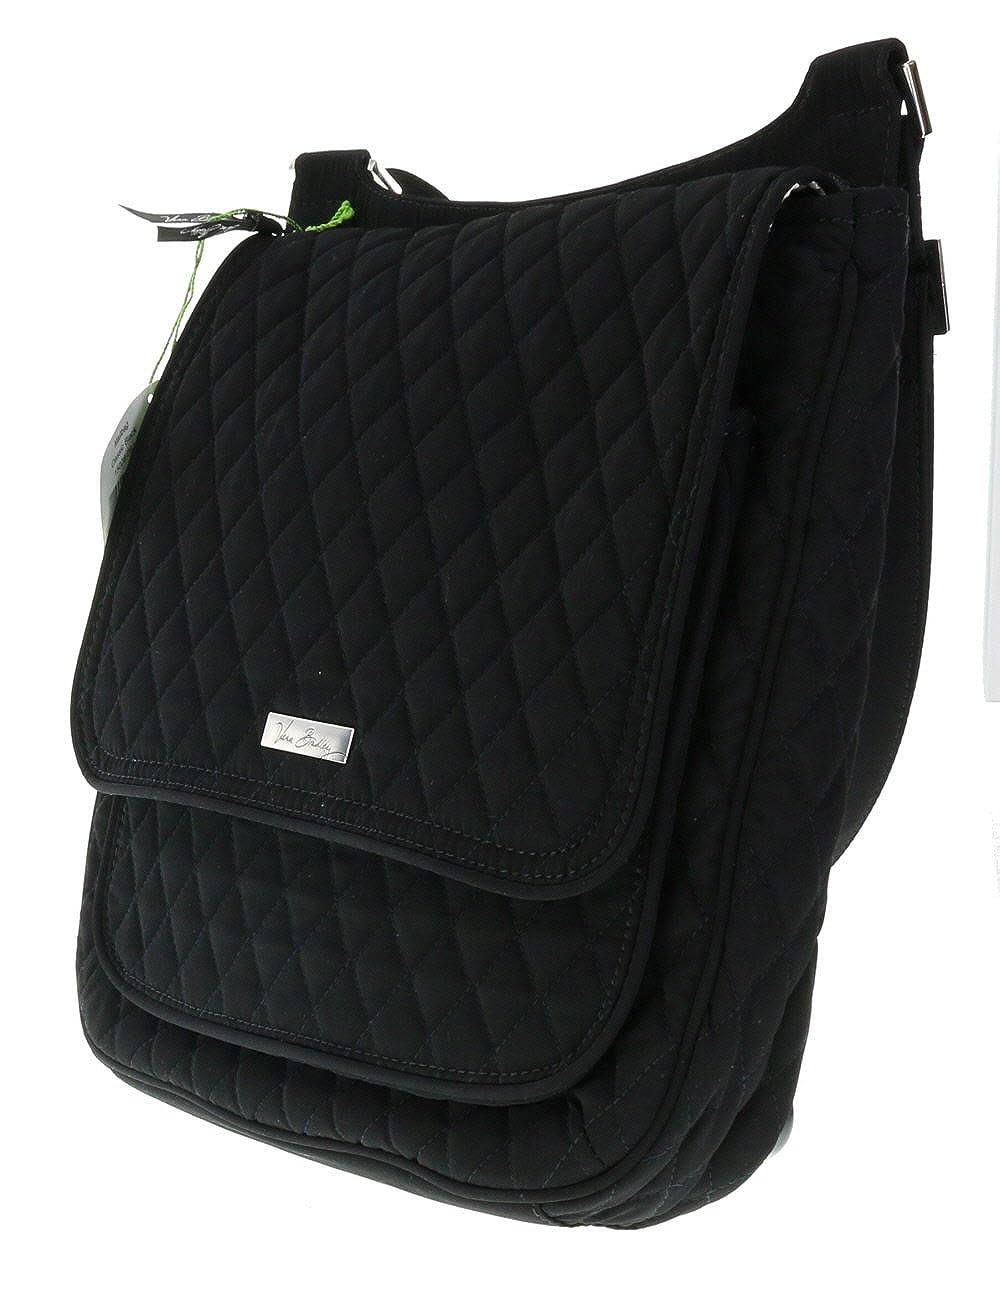 Vera Bradley Cross Body Mailbag in Classic Black  Handbags  Amazon.com f4c1405c34fd4